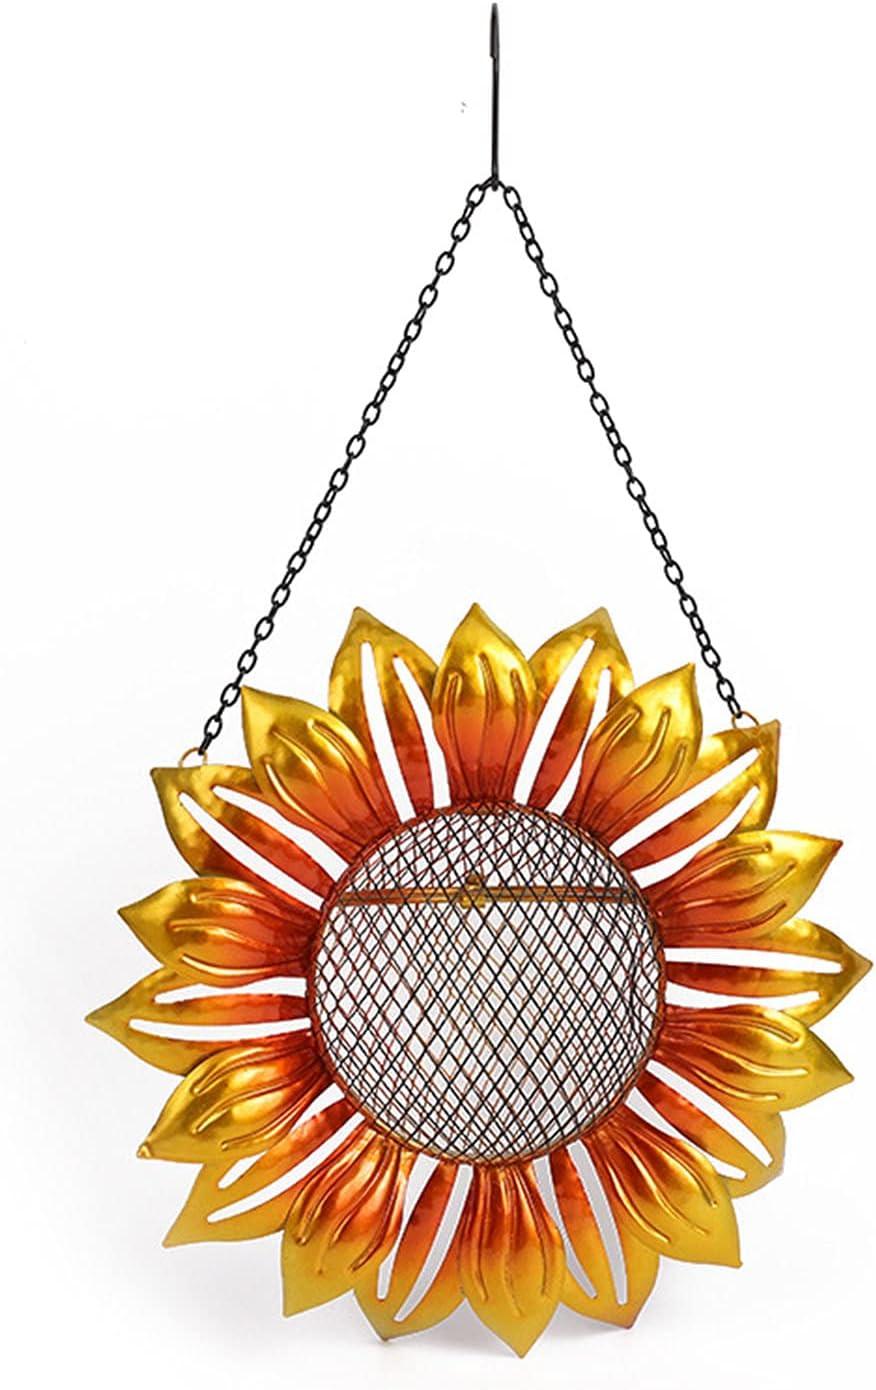 Popular overseas DUDNJC Metal Sunflower Hanging store Bird with Seed Feeder Mesh